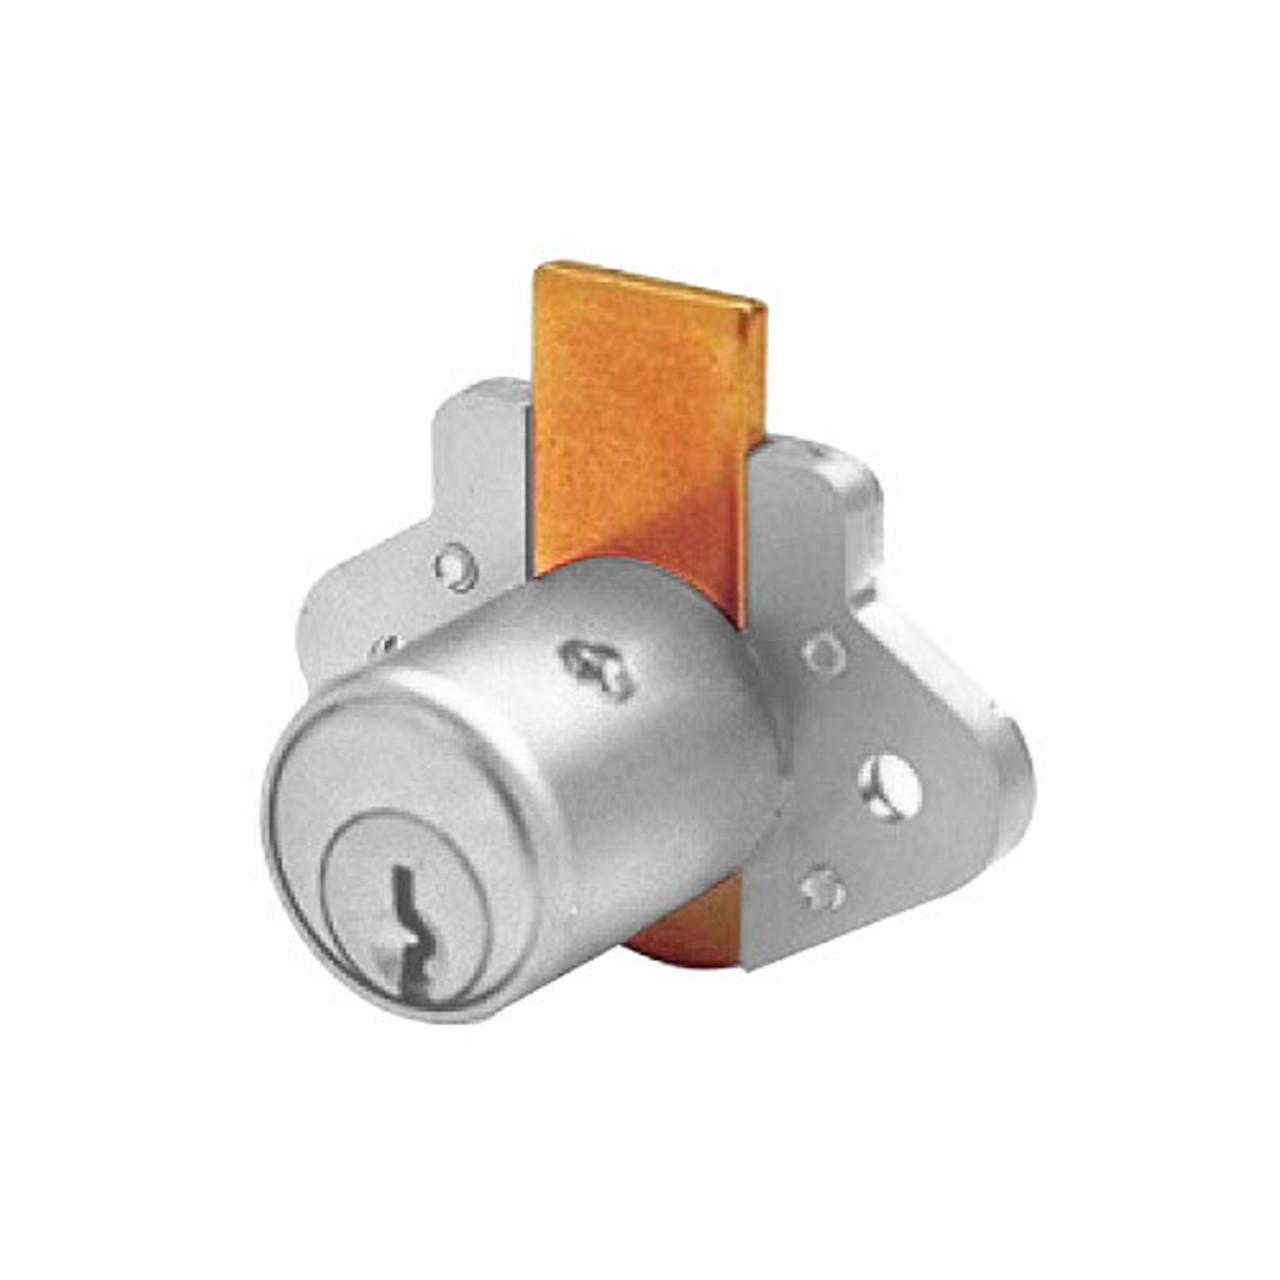 Olympus N078-KA103-26D Cabinet Lock Diamond Back Drawer Lock in Satin Chrome Finish